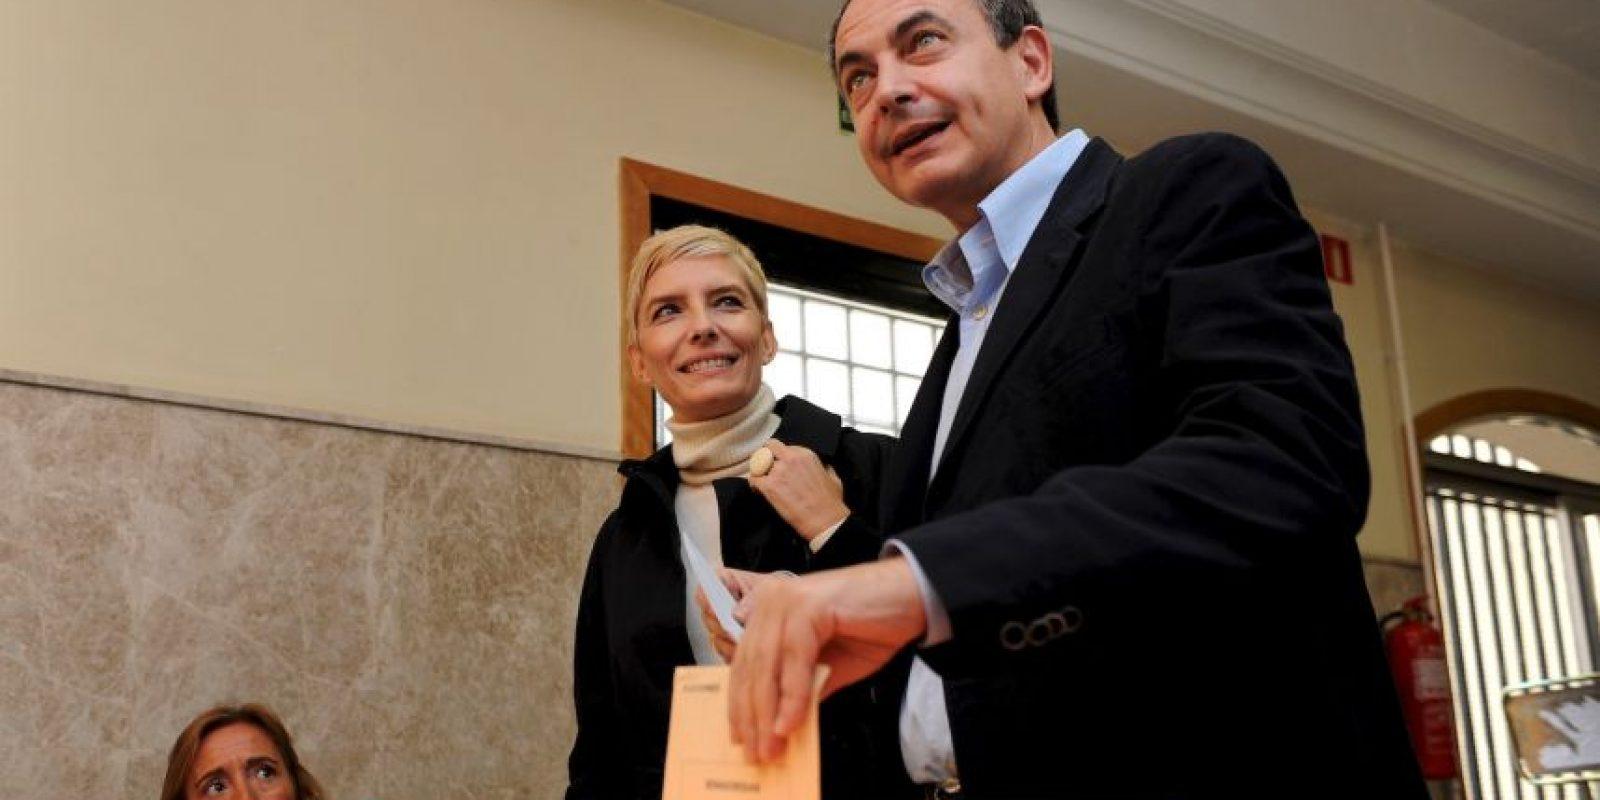 José Luis Rodríguez Zapatero, gobernó España de 2004 a 2011. Foto:Getty Images